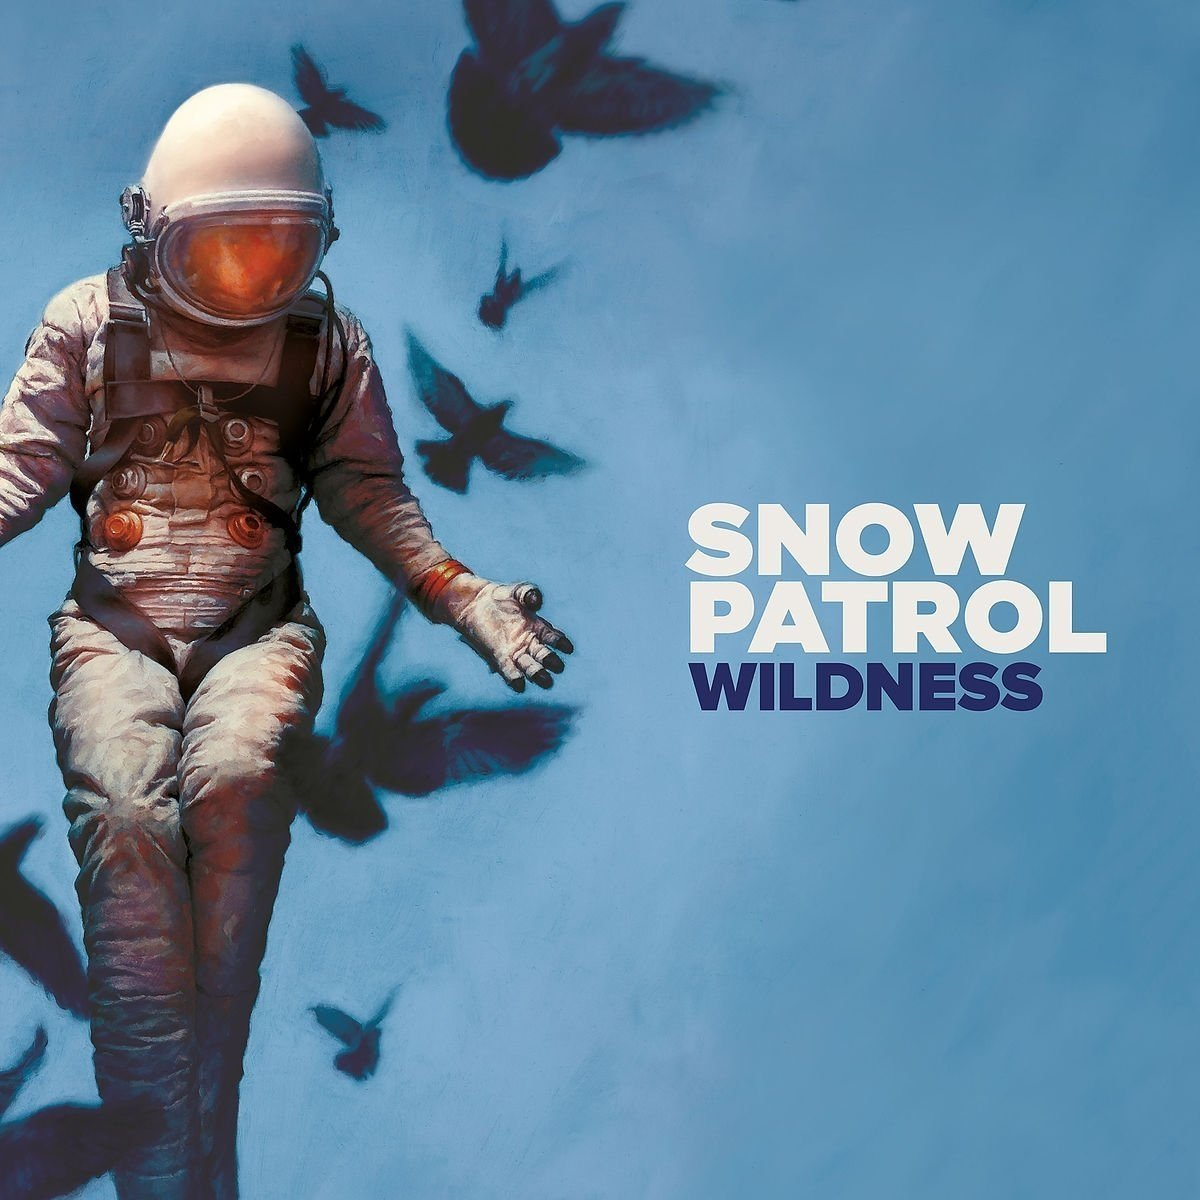 Snow Patrol - Wildness (2018) Mp3 -320 Kbps